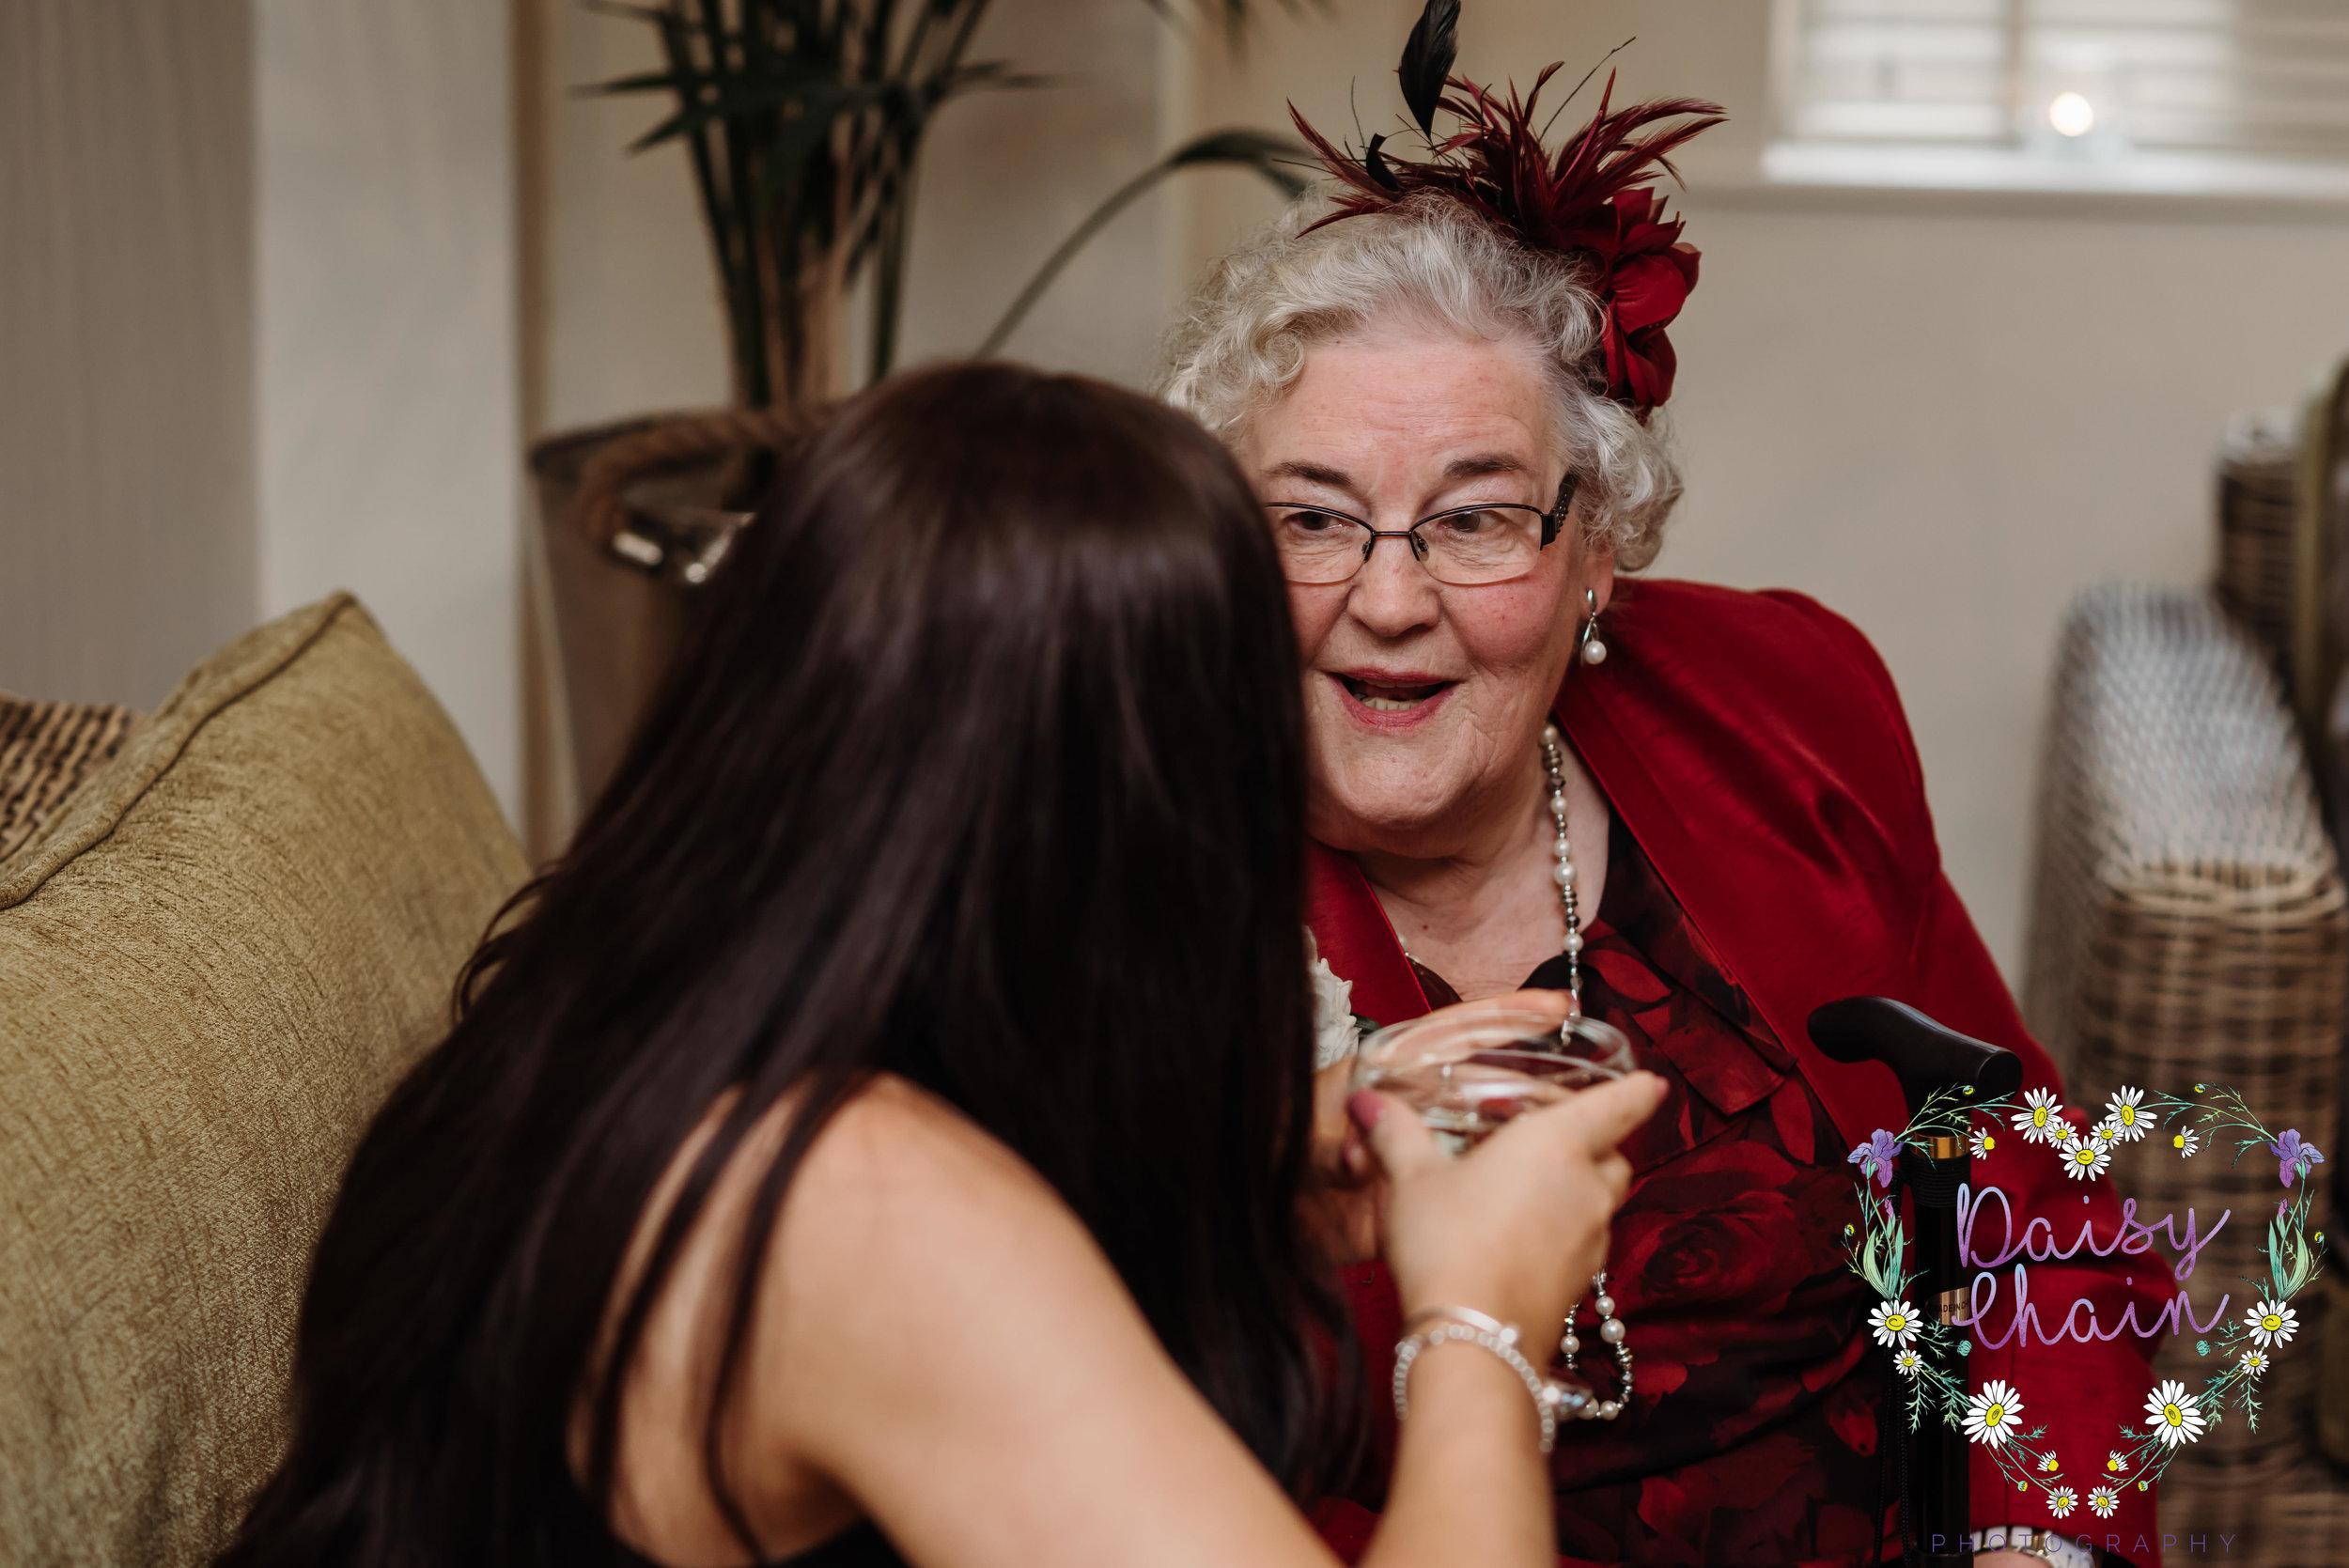 Grandma at a wedding